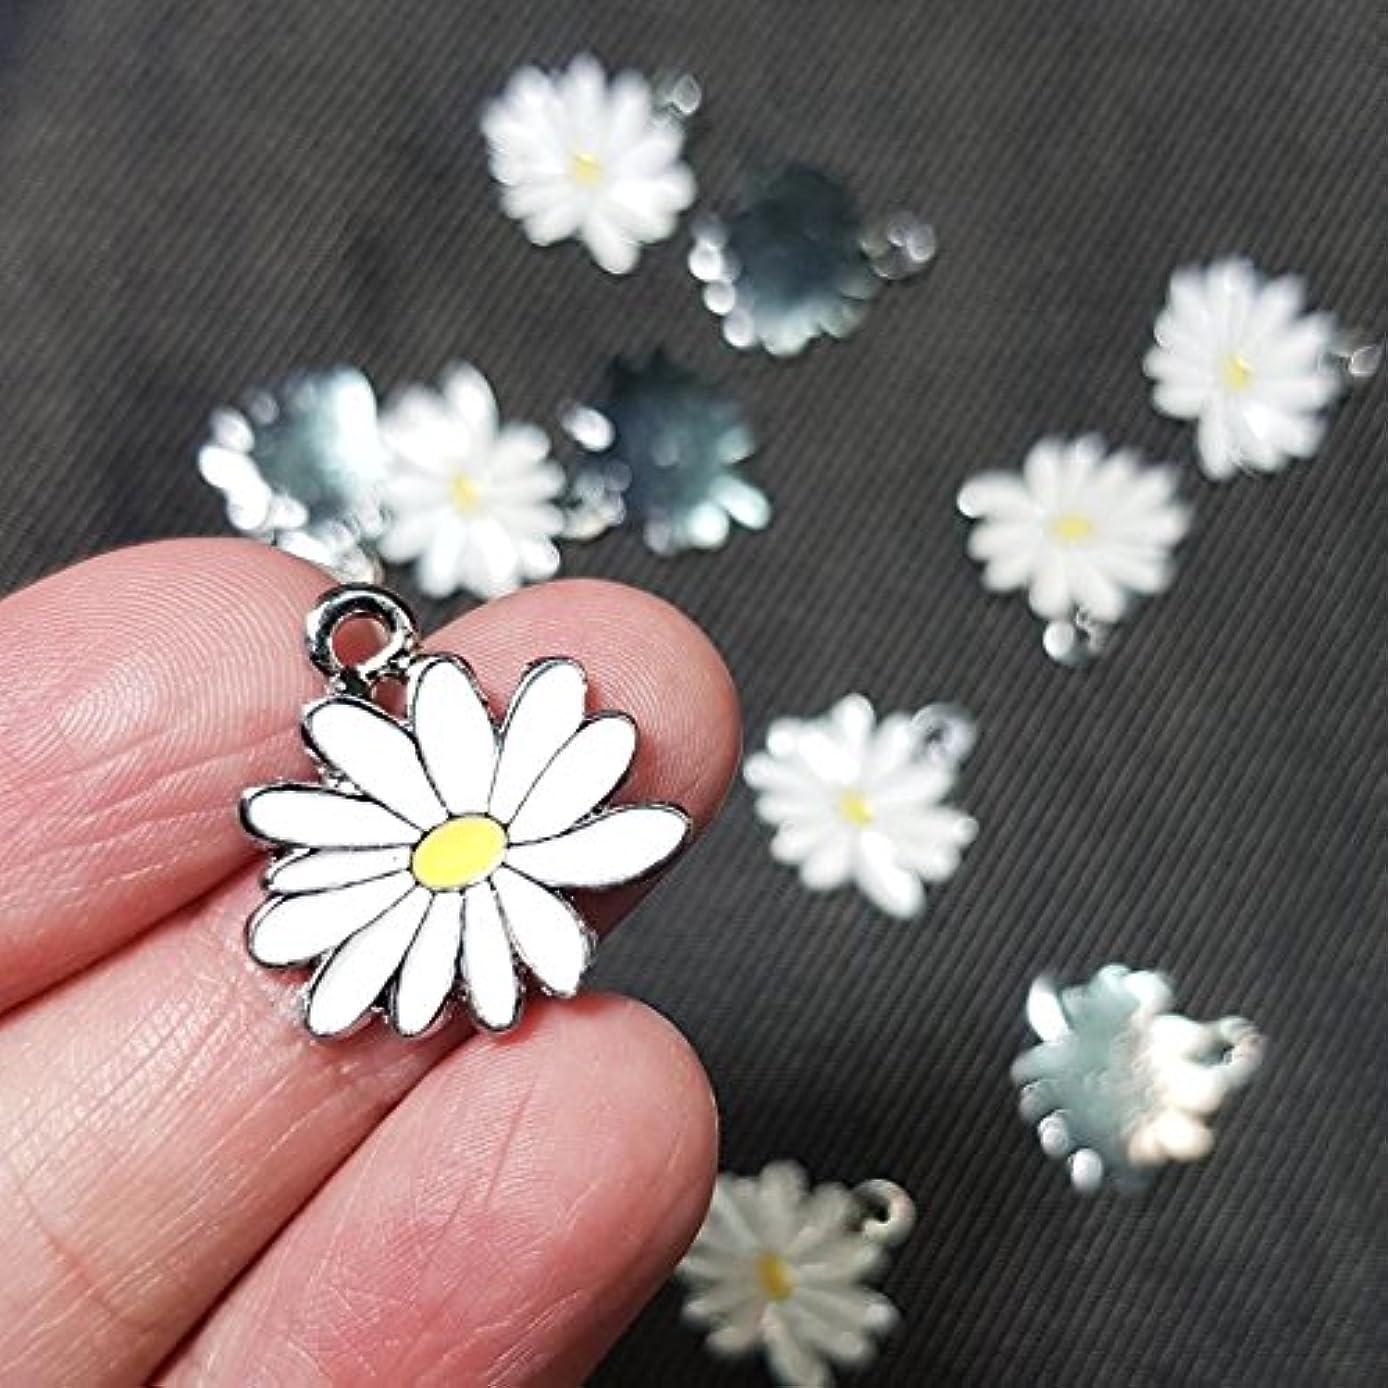 12 Little White Yellow Daisy Flower Charms 20x20mm Enamel Charm Pendant (NS803)